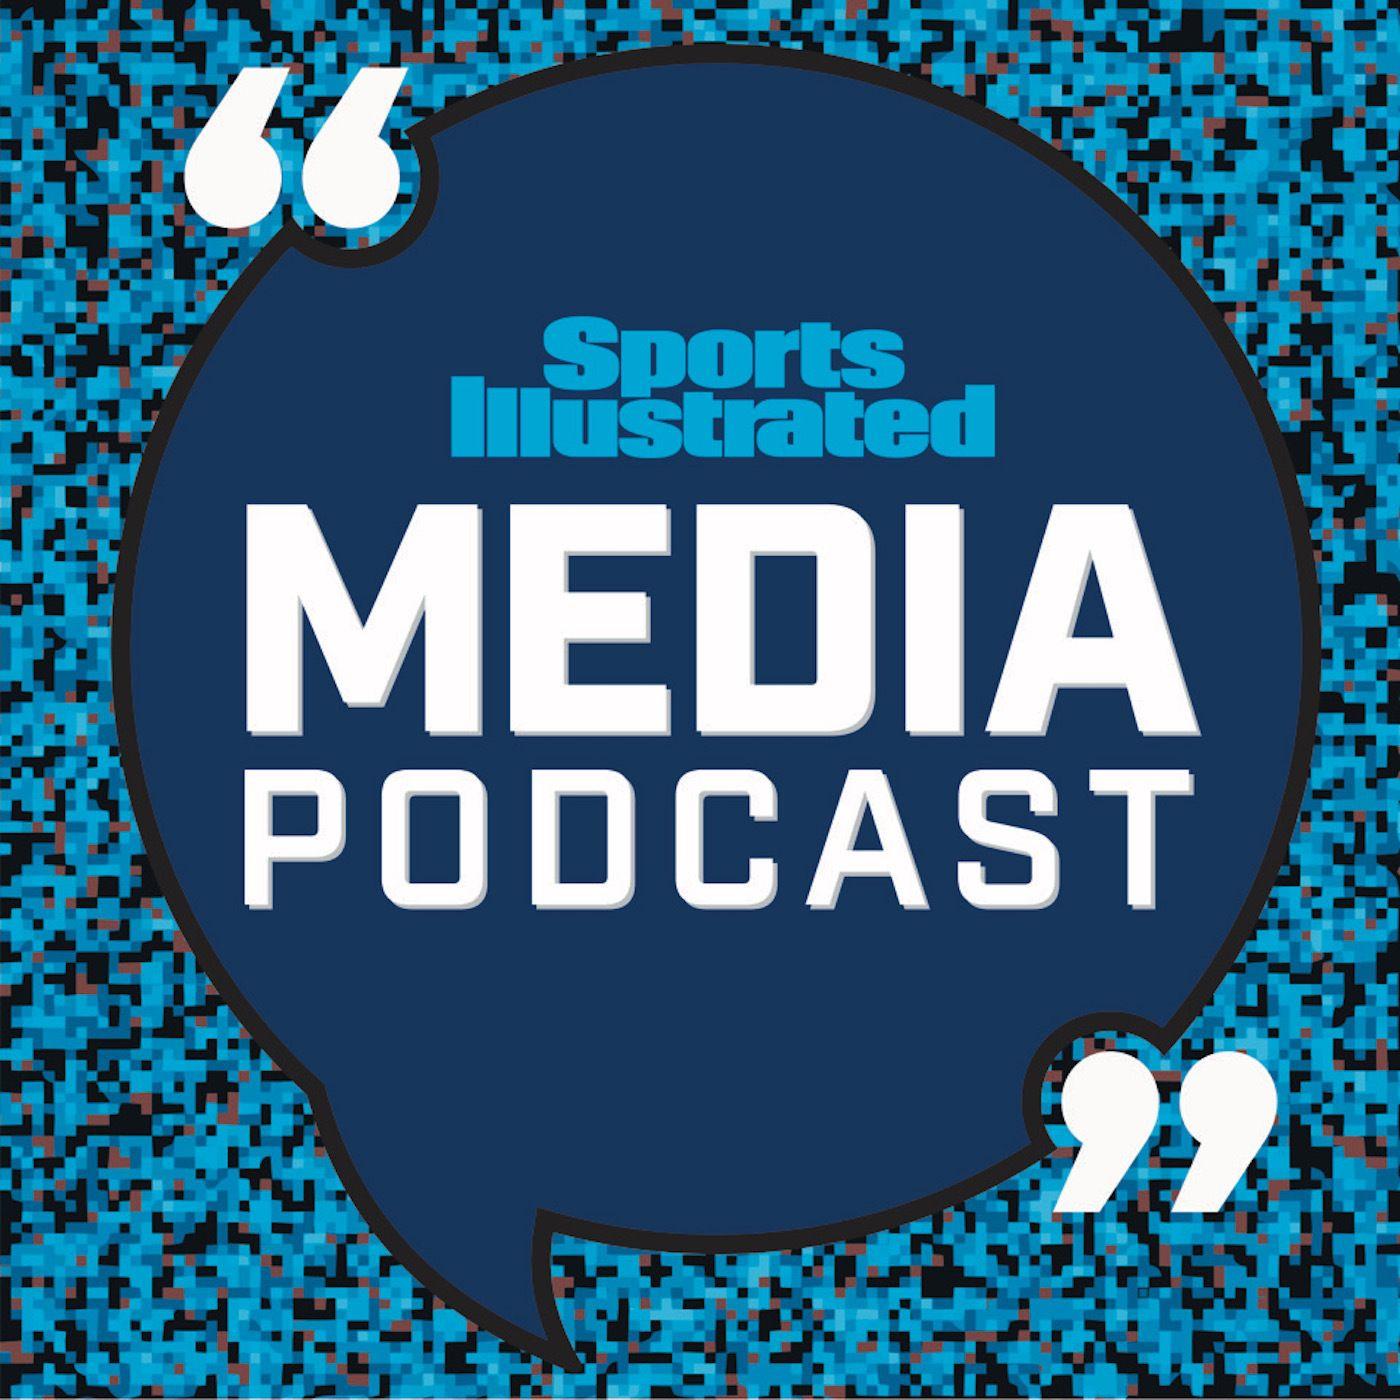 foto de Sports Illustrated Media Podcast | Podbay